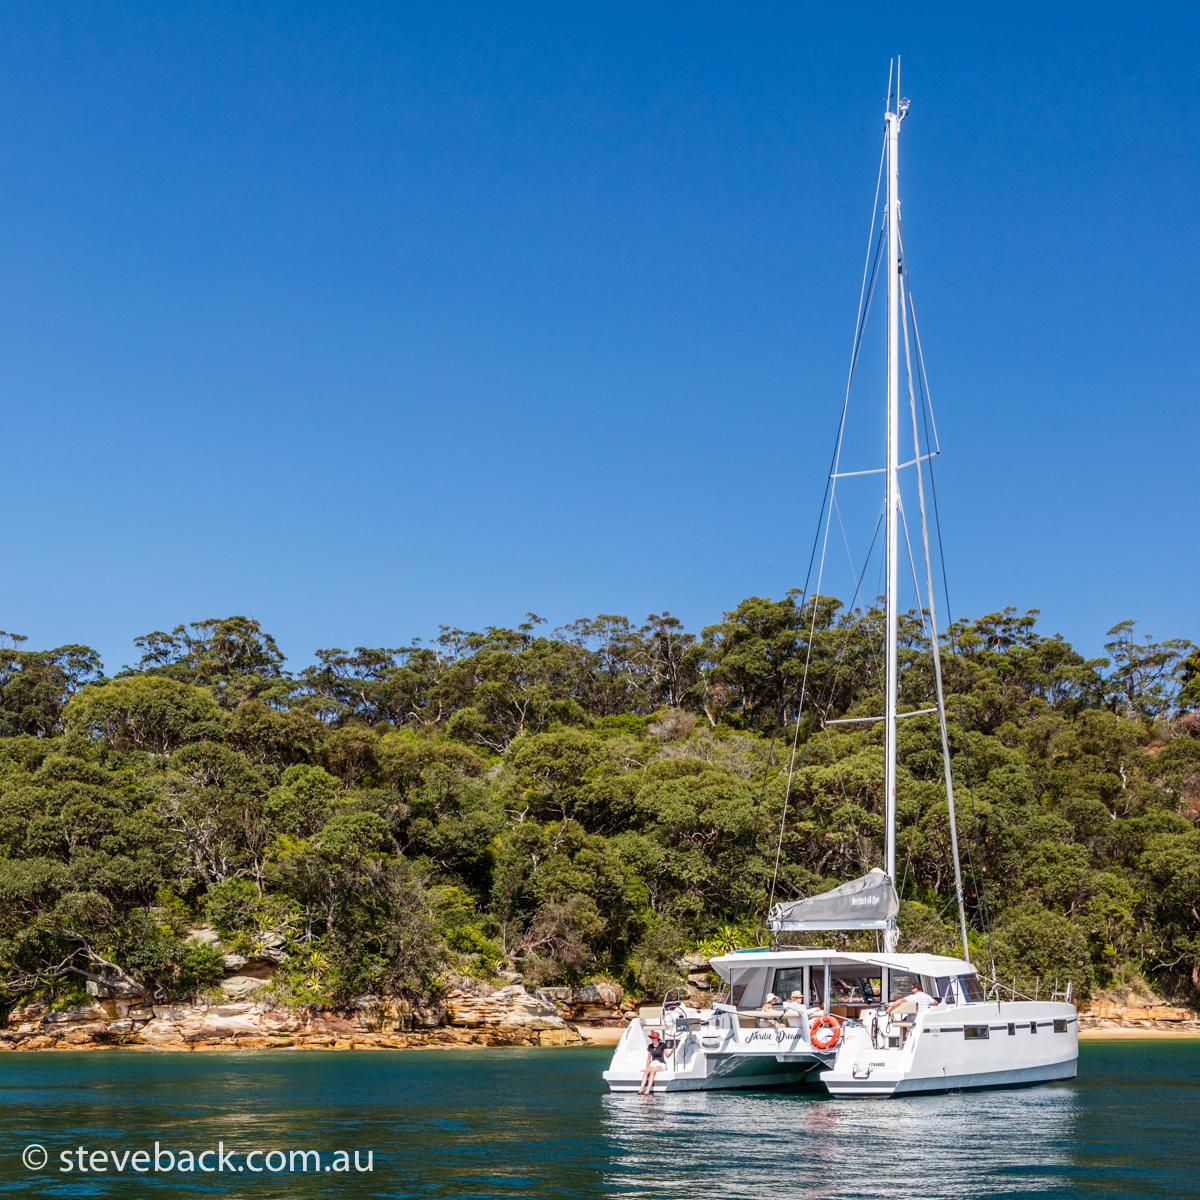 Anyboat-catamaran-Nordic-dream-maritime-boat-photography-01.jpg